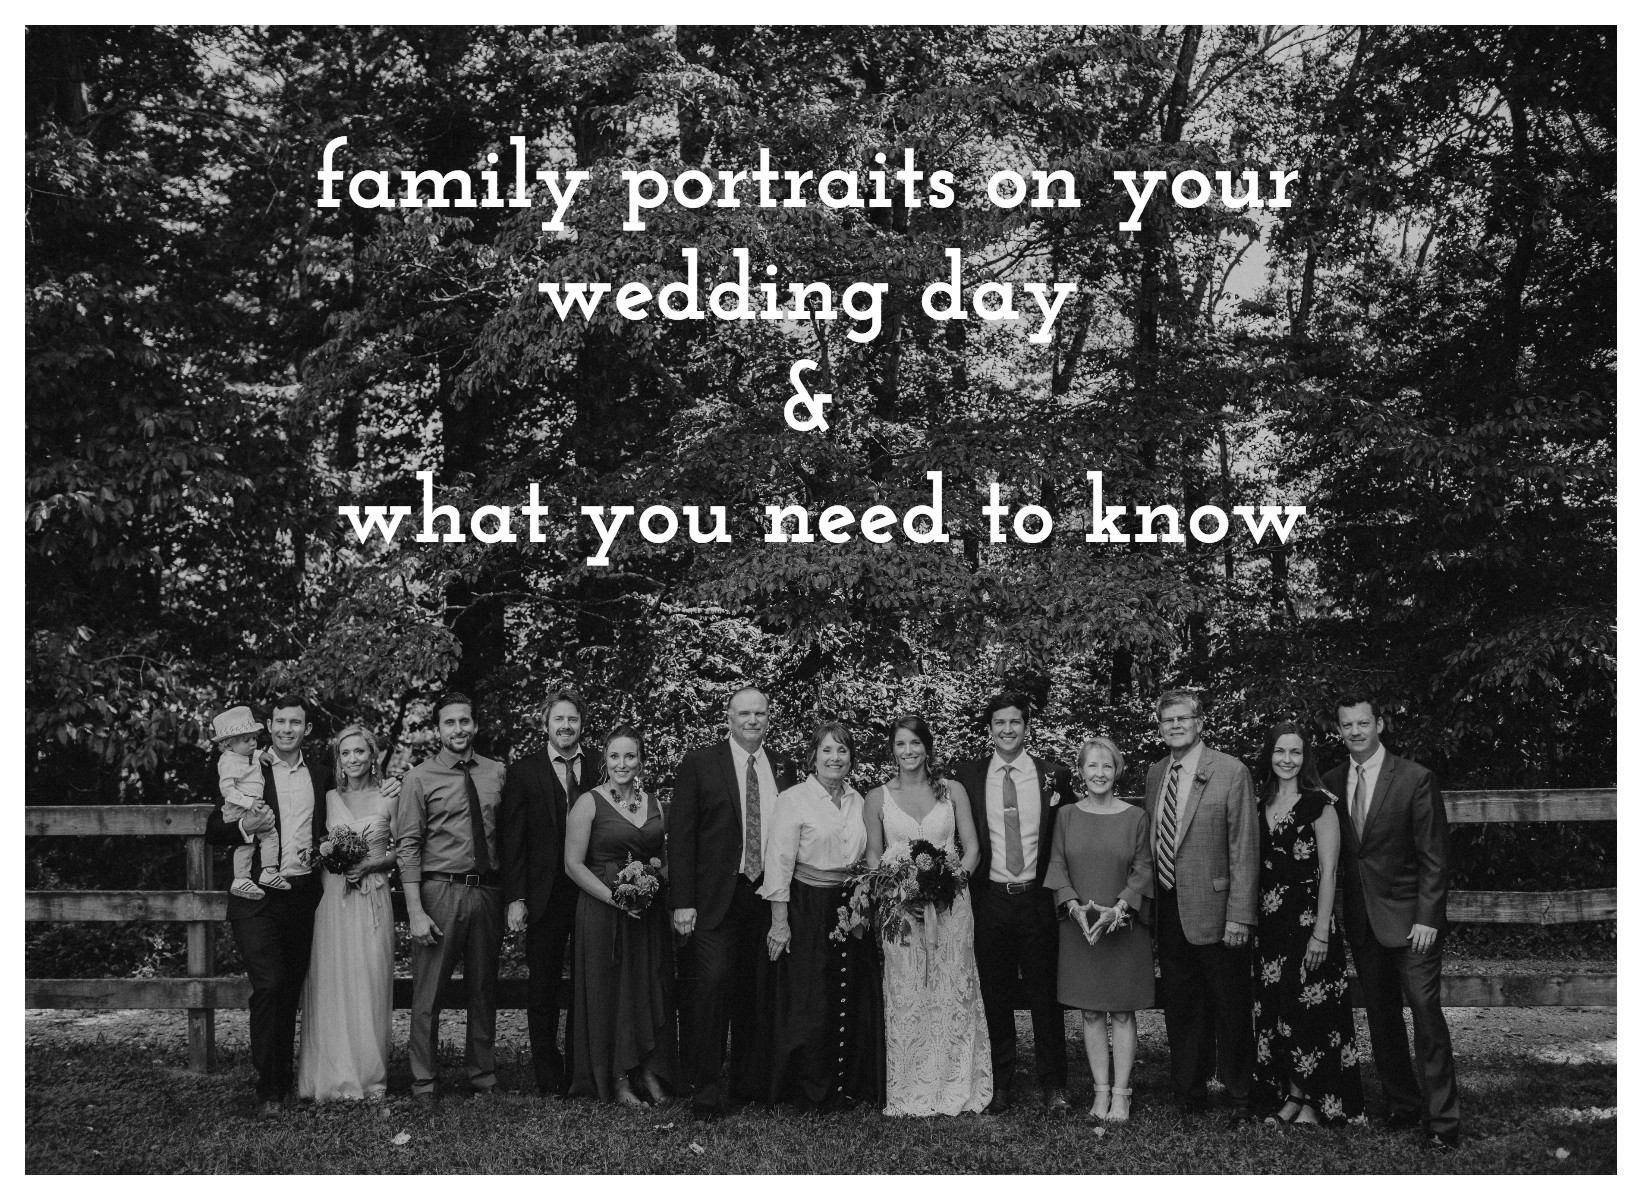 FotoJet-family portraits.jpg